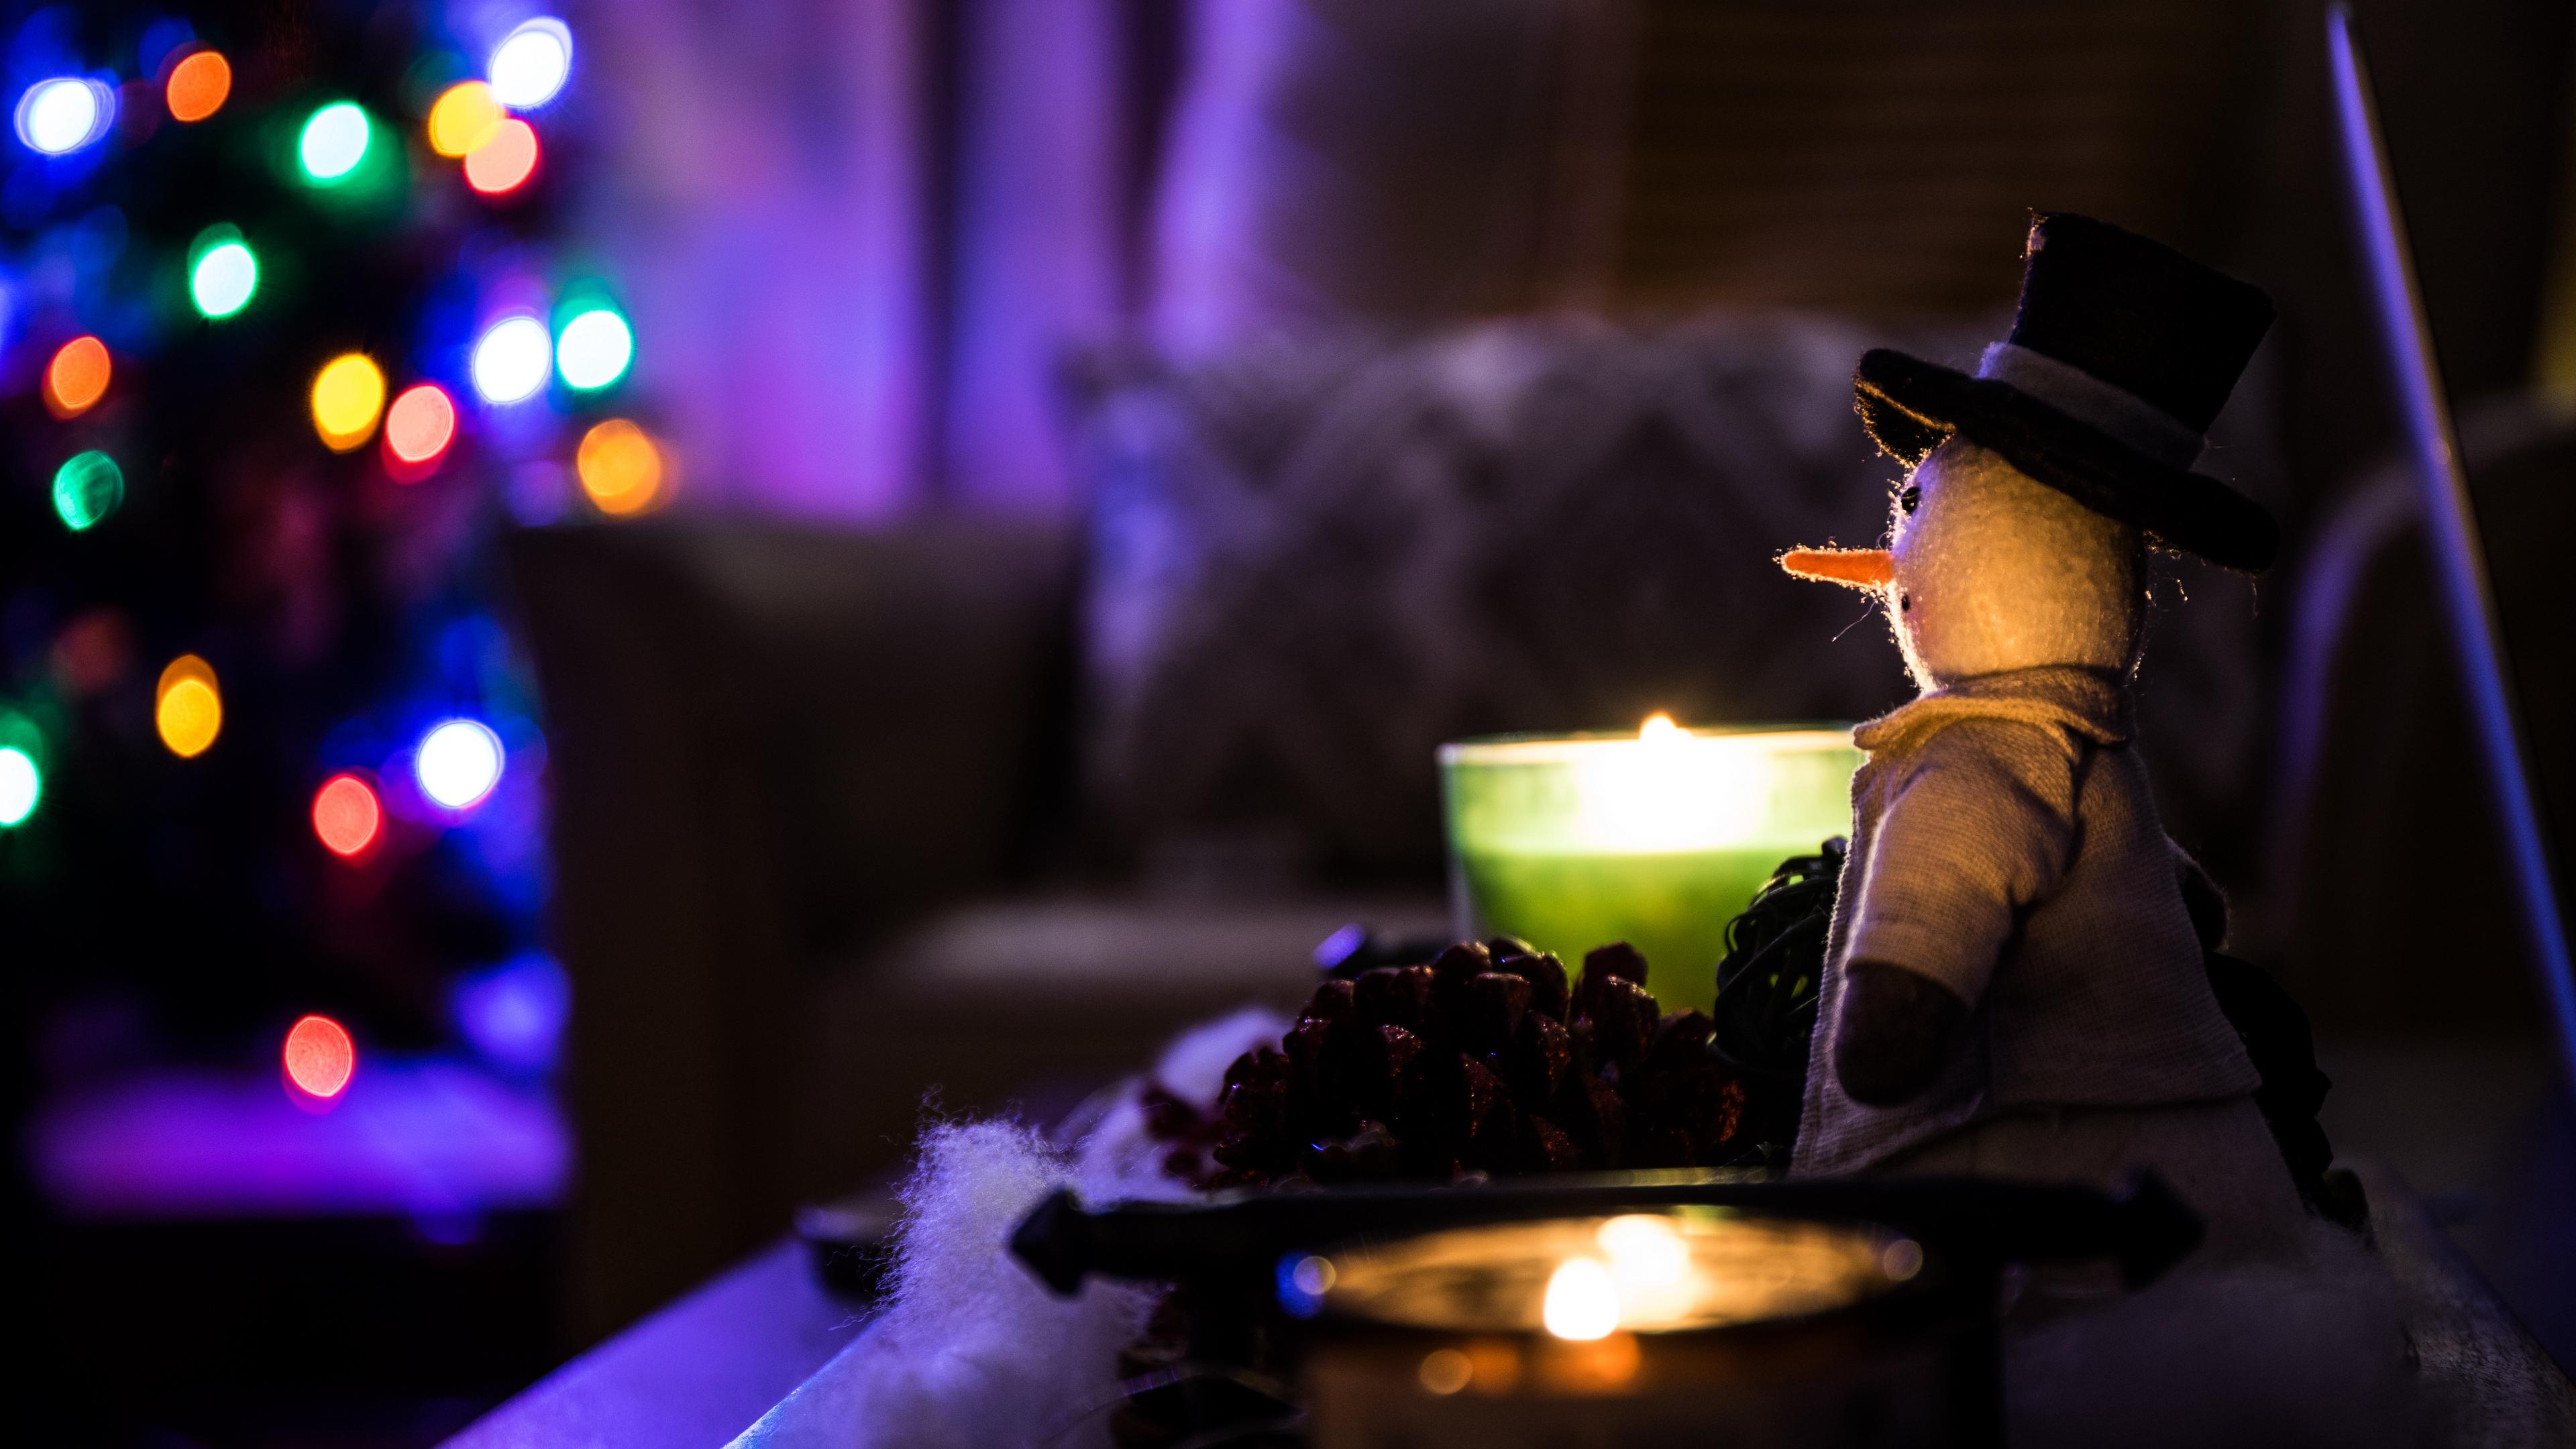 snowman christmas candles 4k 1538345237 - snowman, christmas, candles 4k - Snowman, Christmas, Candles